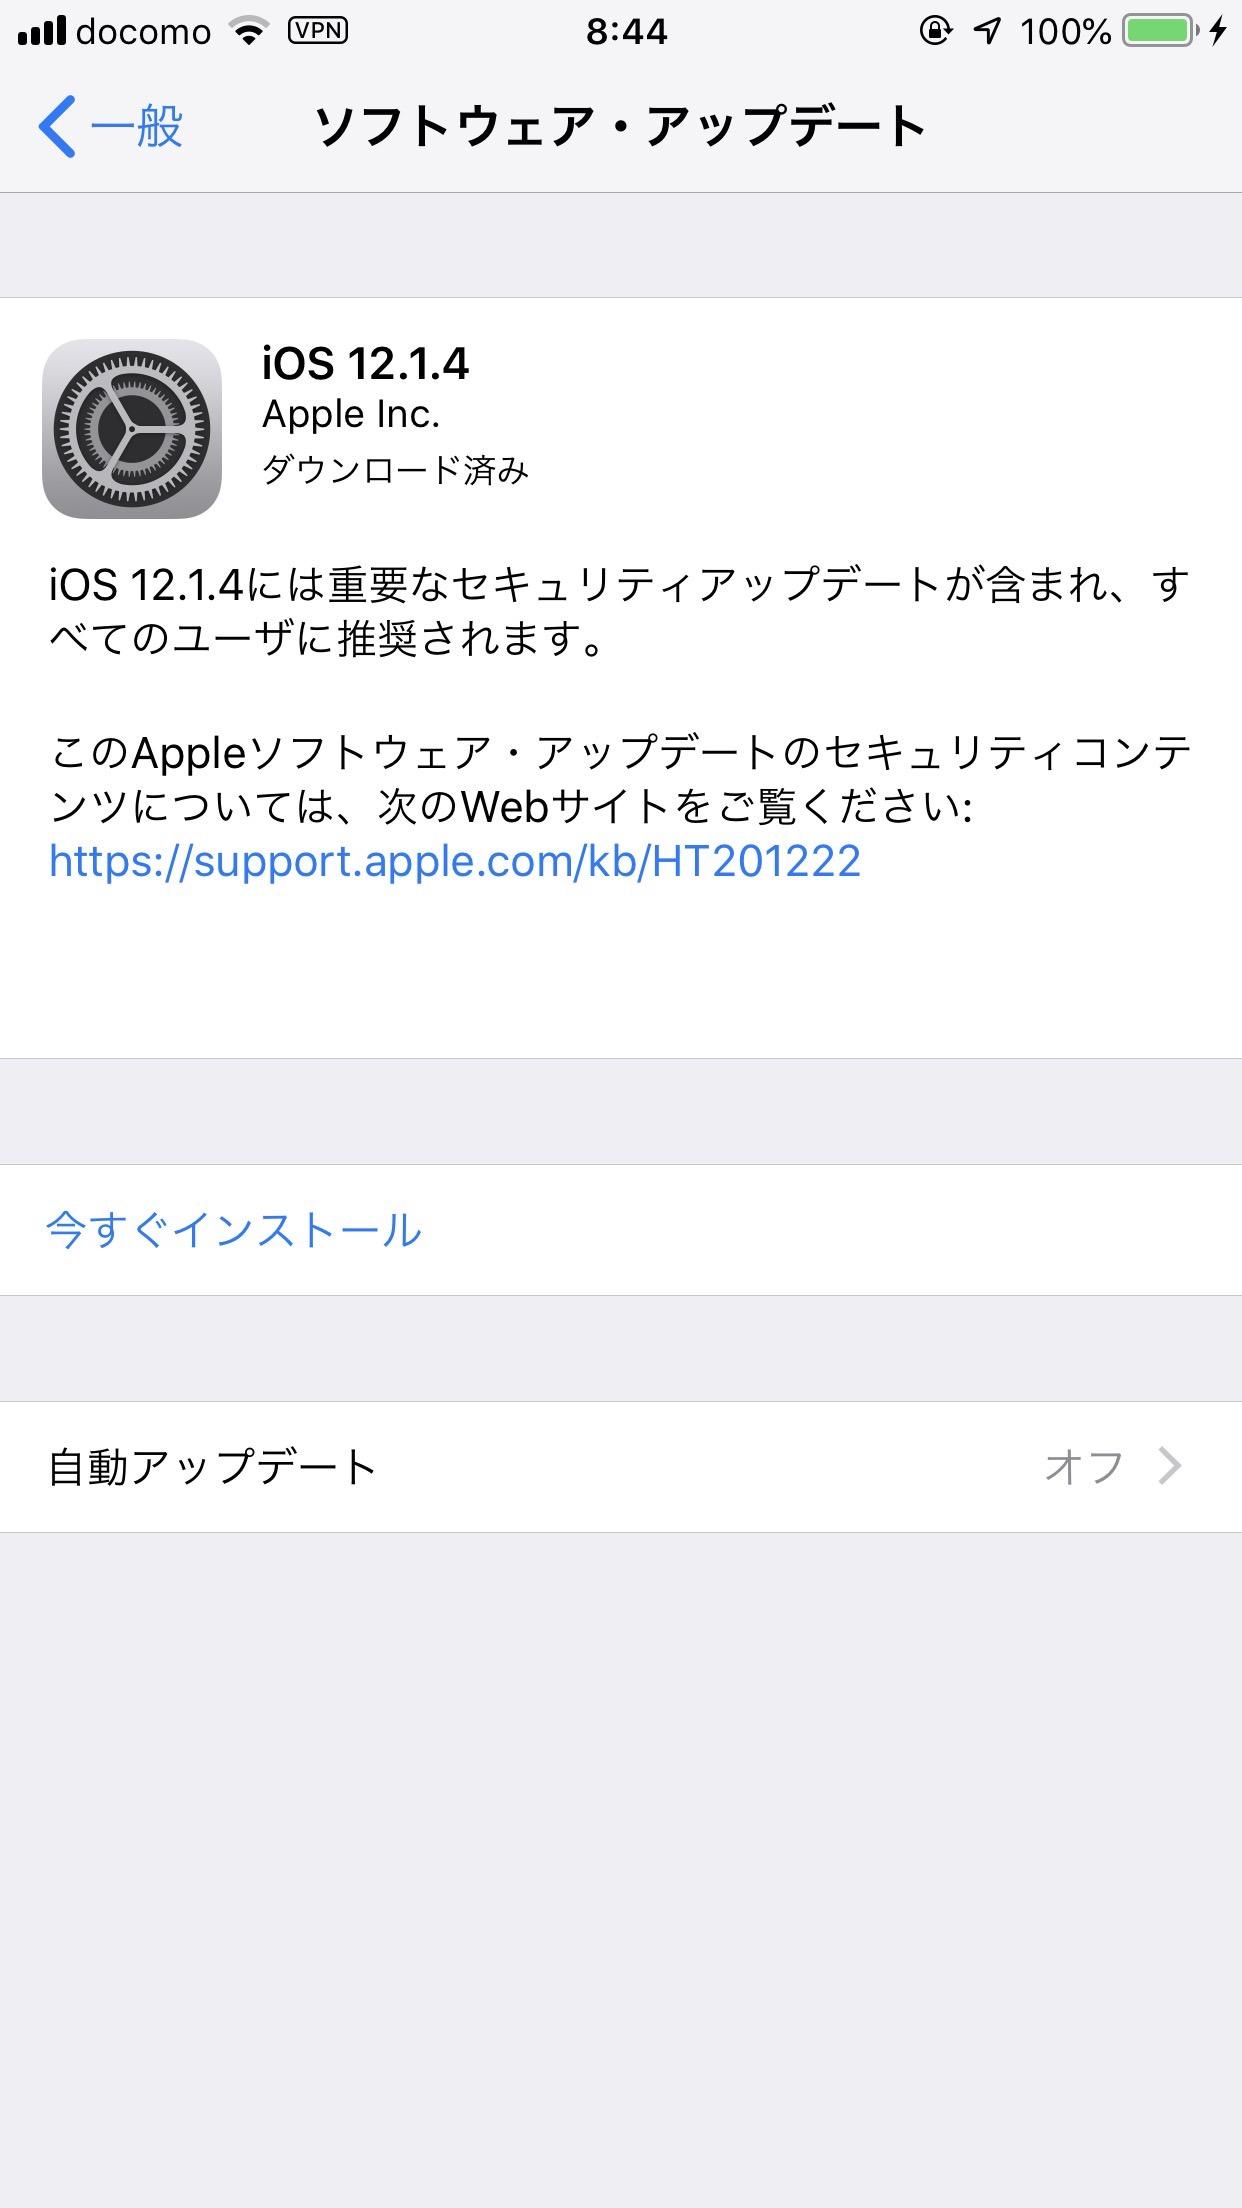 【iOS 12】「iOS 12.1.4 ソフトウェアアップデート」リリース